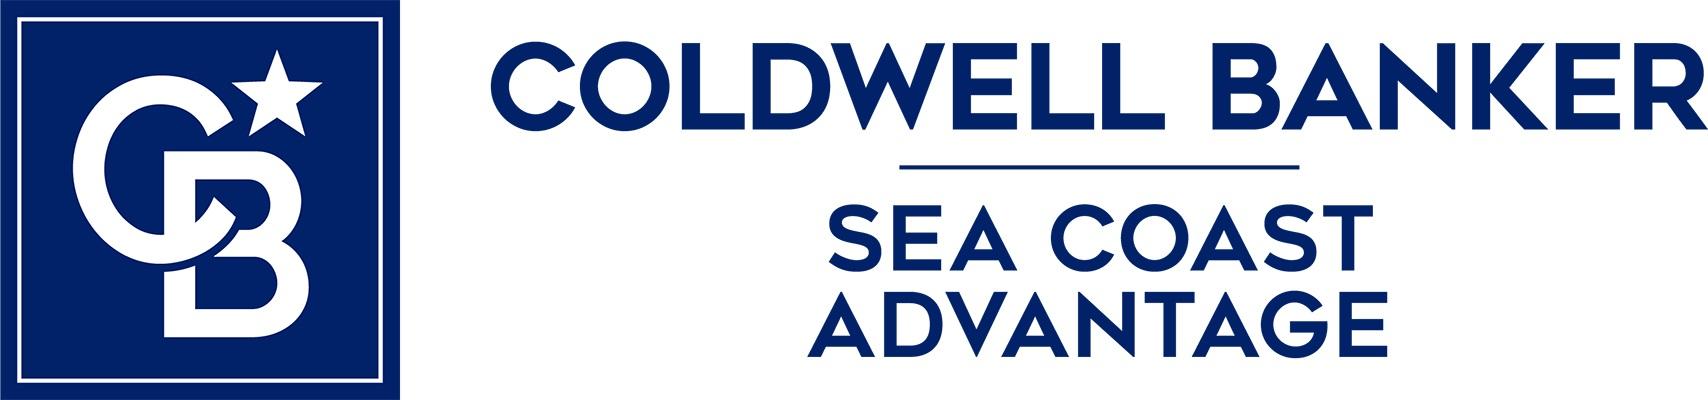 Teri Wray - Coldwell Banker Sea Coast Advantage Realty Logo